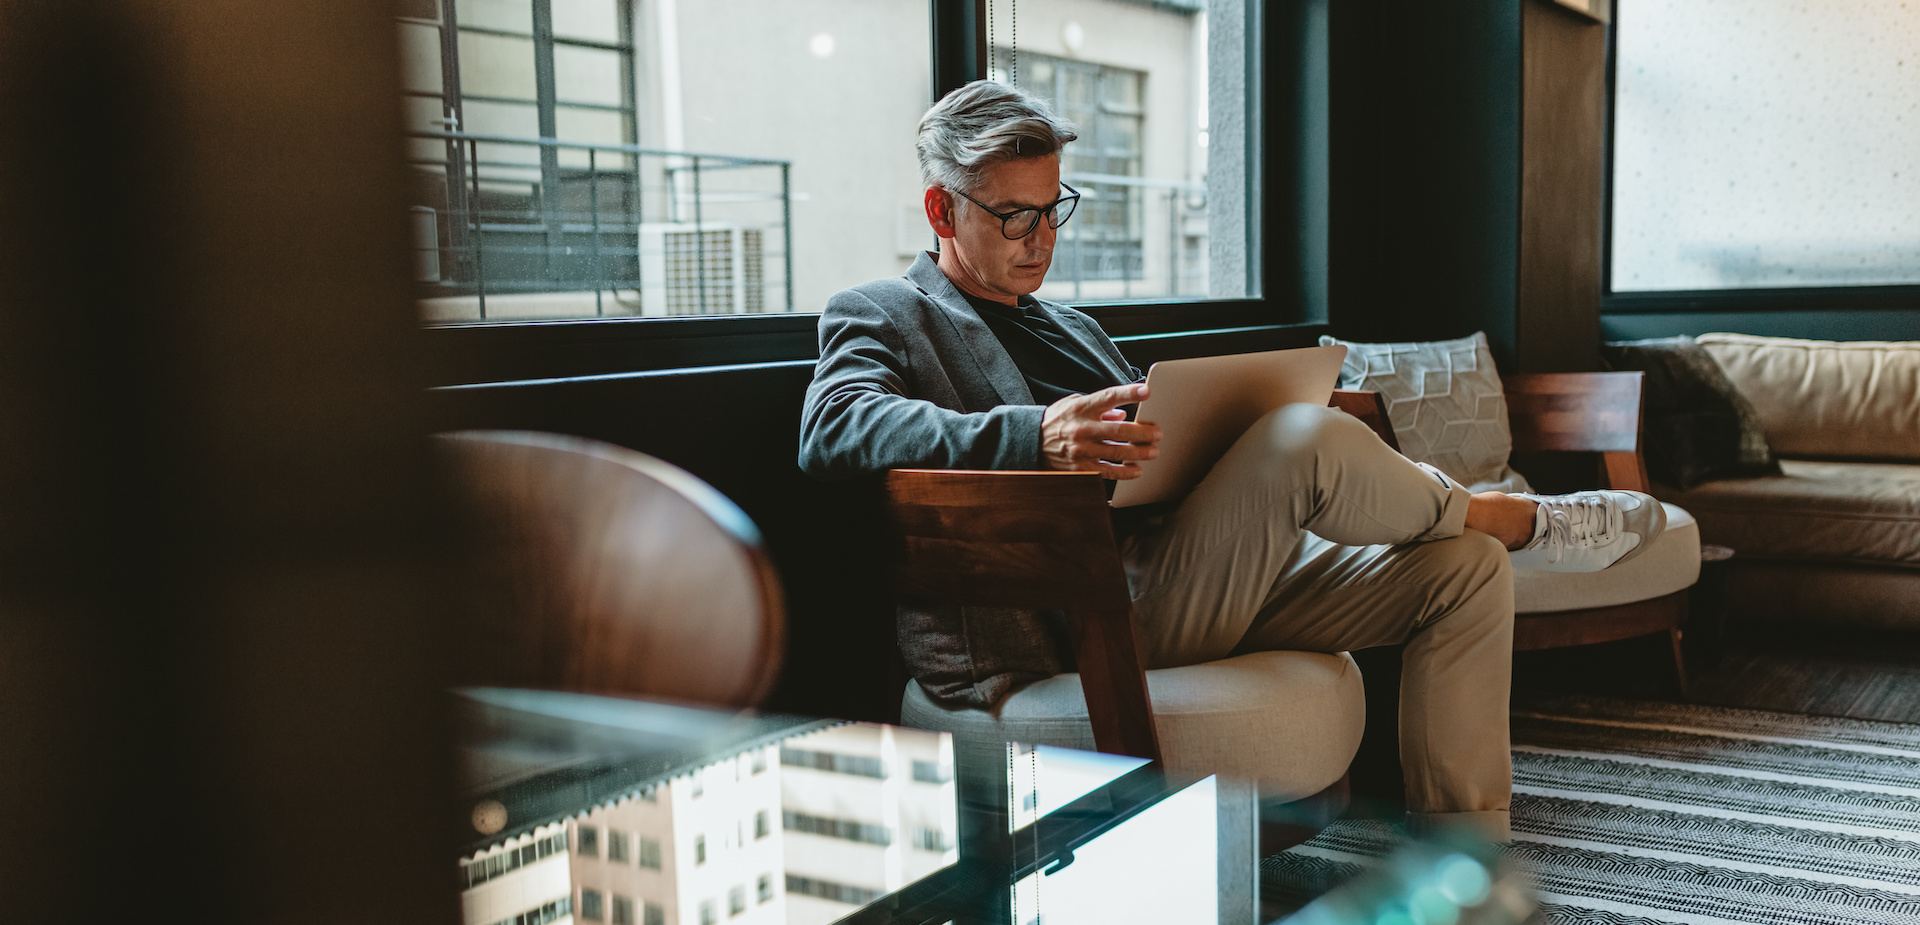 Photo: Jacob Lund, YFS Magazine, Adobe Stock